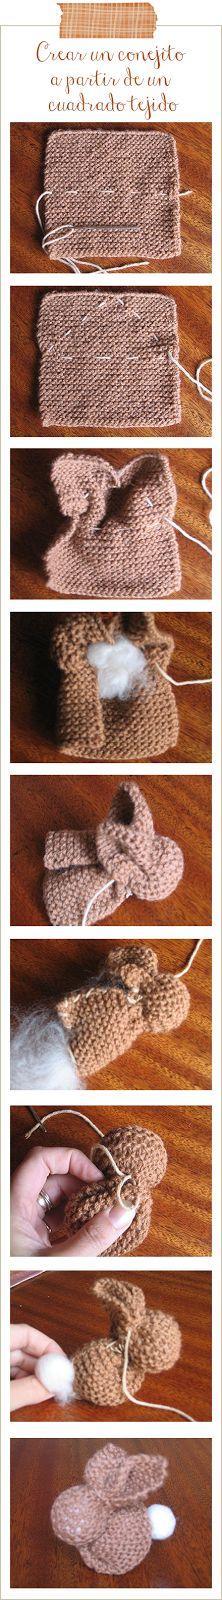 Conejito fácil a partir de un cuadrado tejido - Easy bunny from a knited square